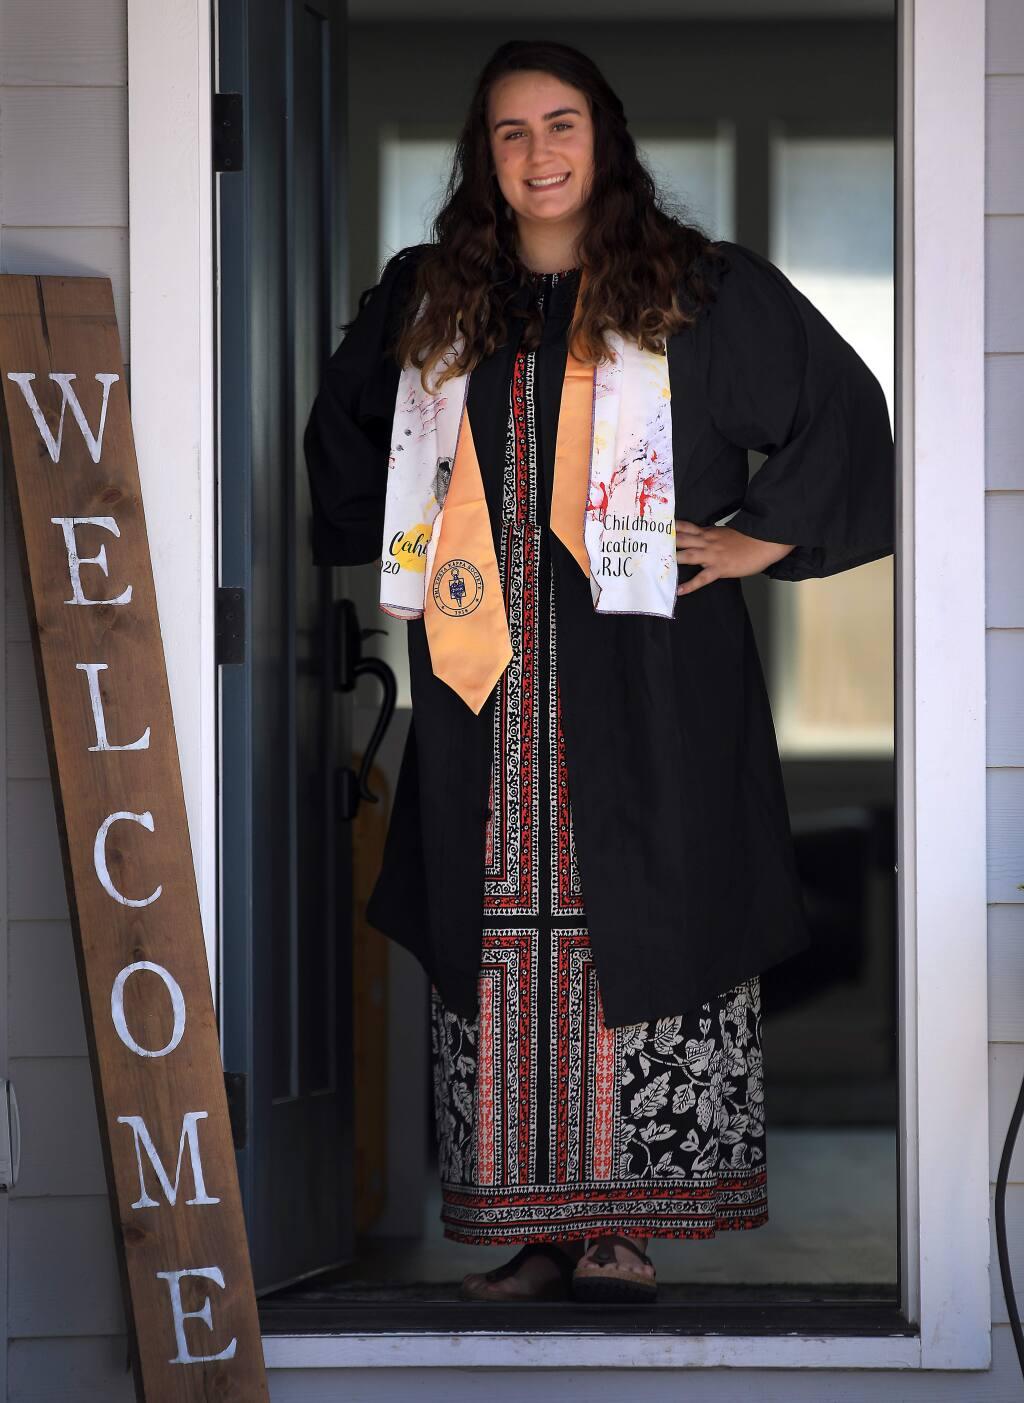 Jessica Cahill of Santa Rosa is graduating from Santa Rosa Junior College, Saturday, May 23, 2020 during a virtual celebration because of the coronavirus pandemic. Photo taken Thursday, May 21, 2020. (Kent Porter / The Press Democrat) 2020